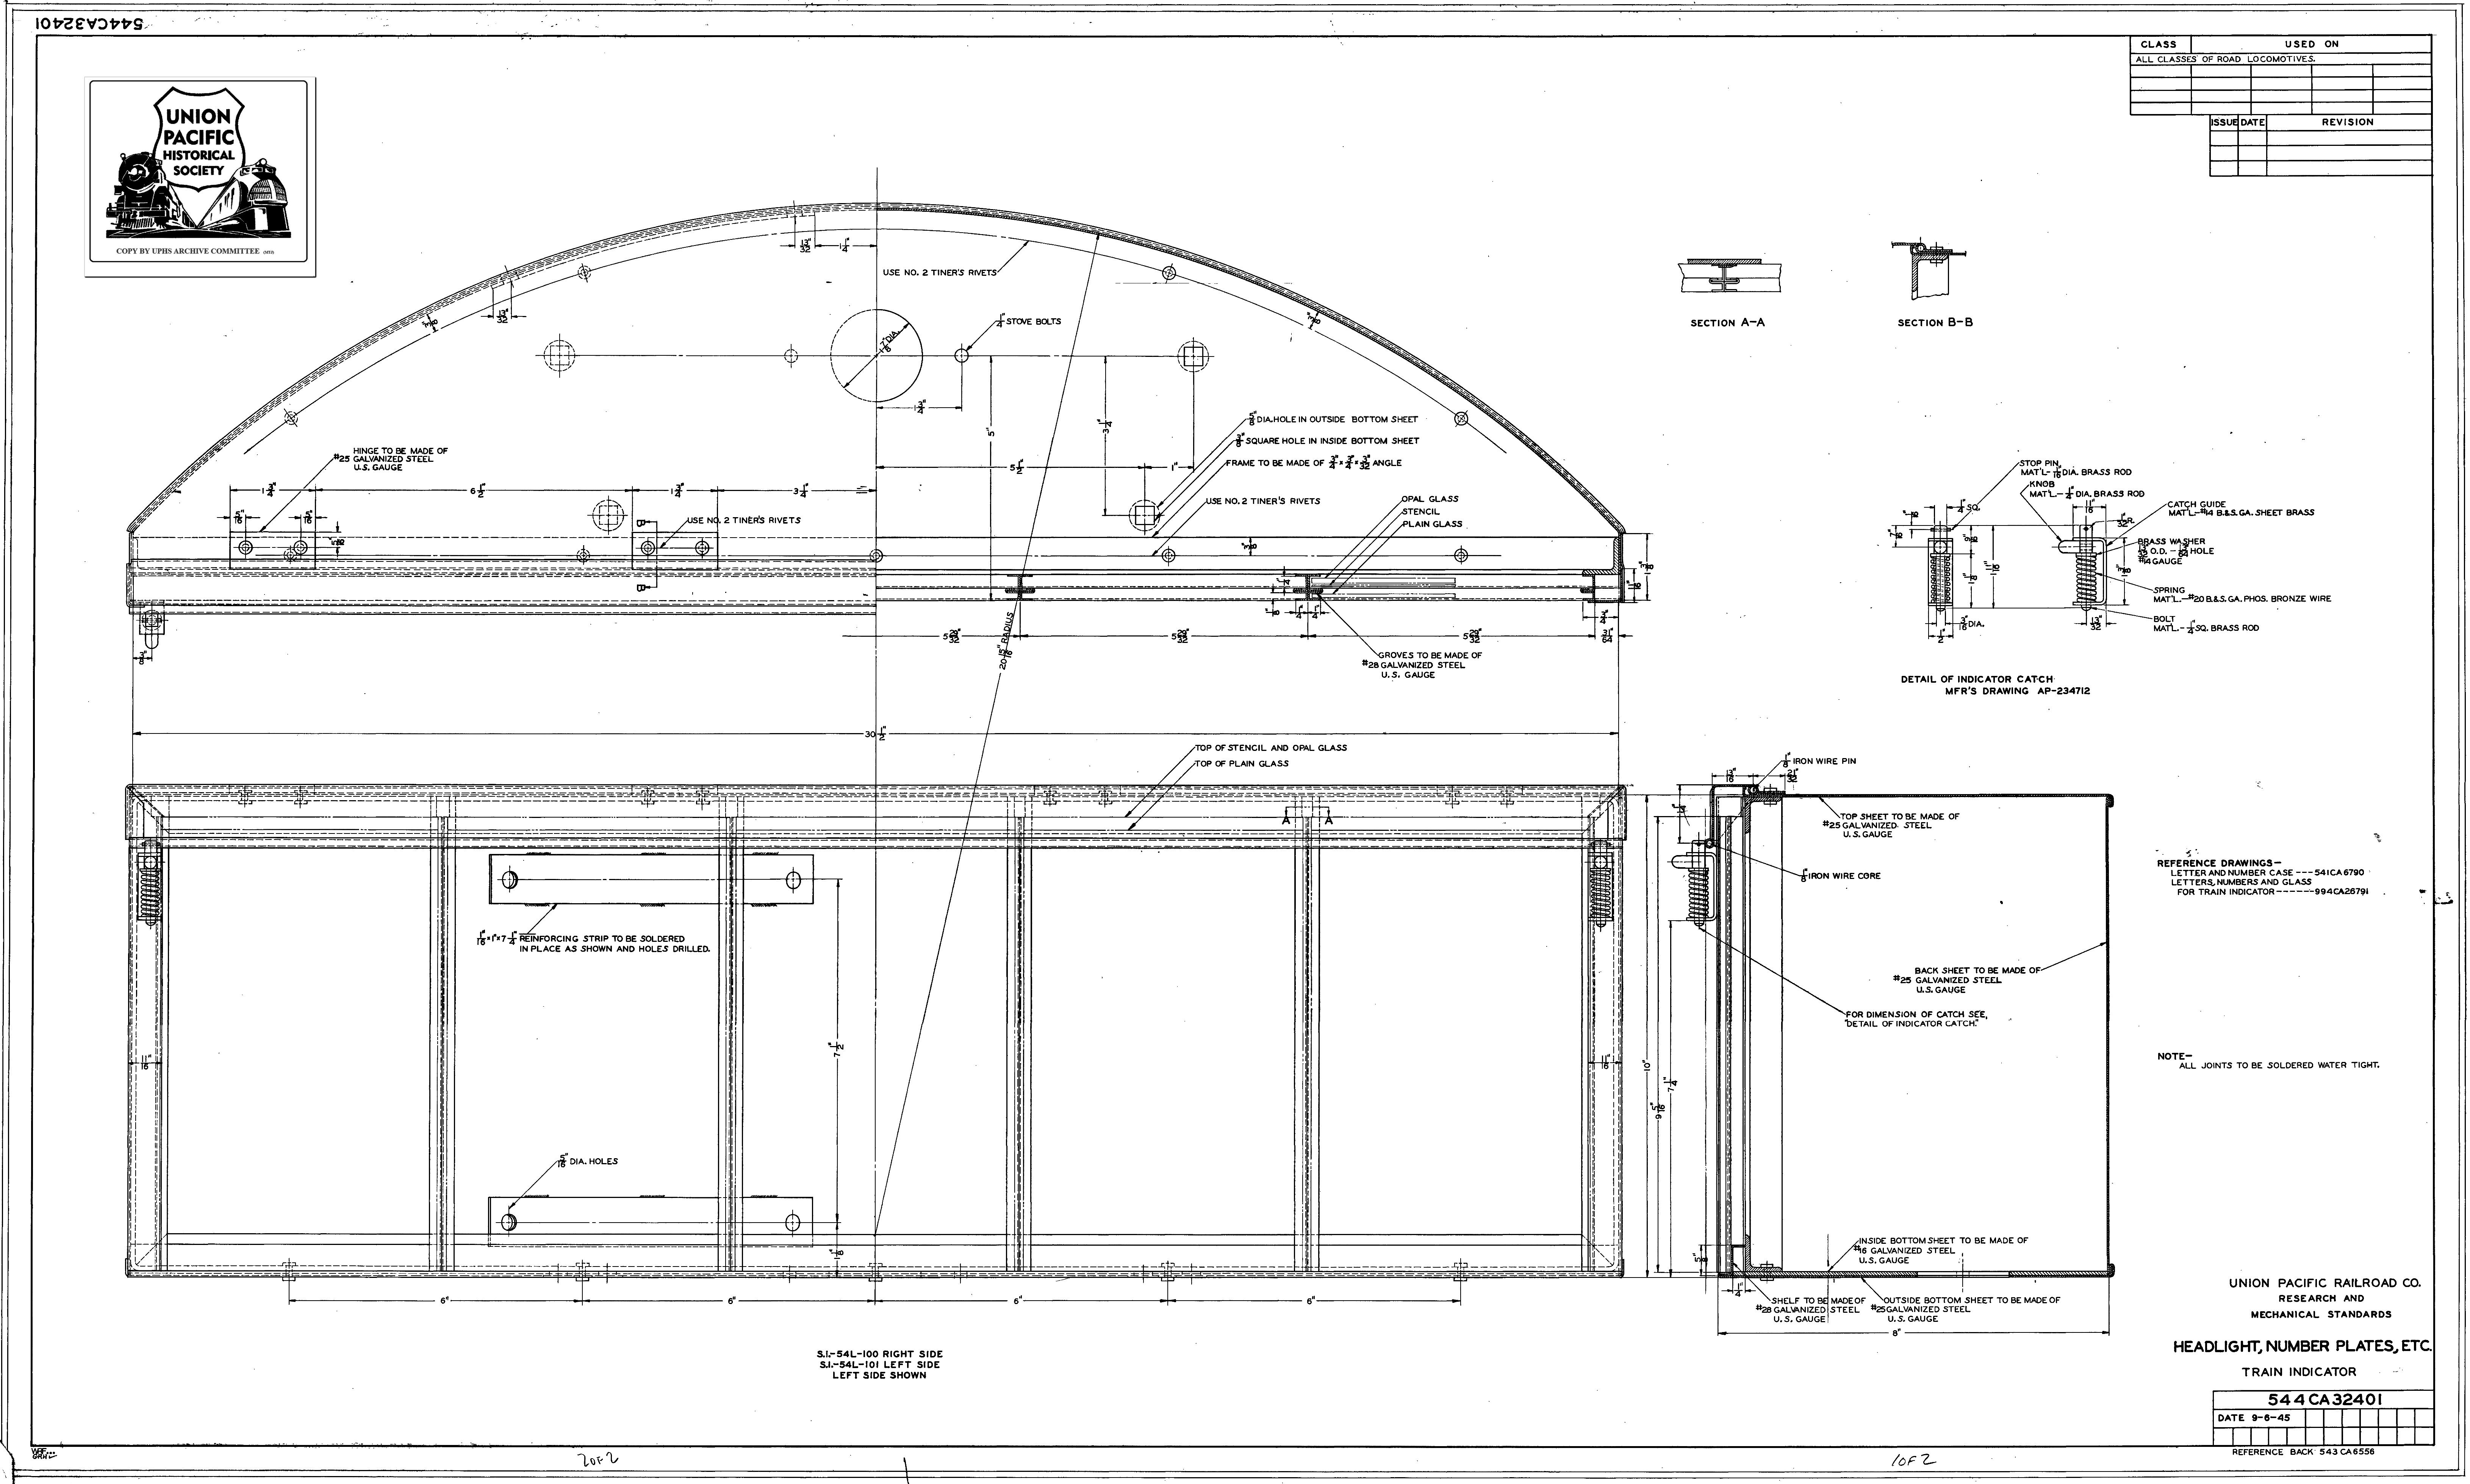 N Scale Layout Wiring Diagram